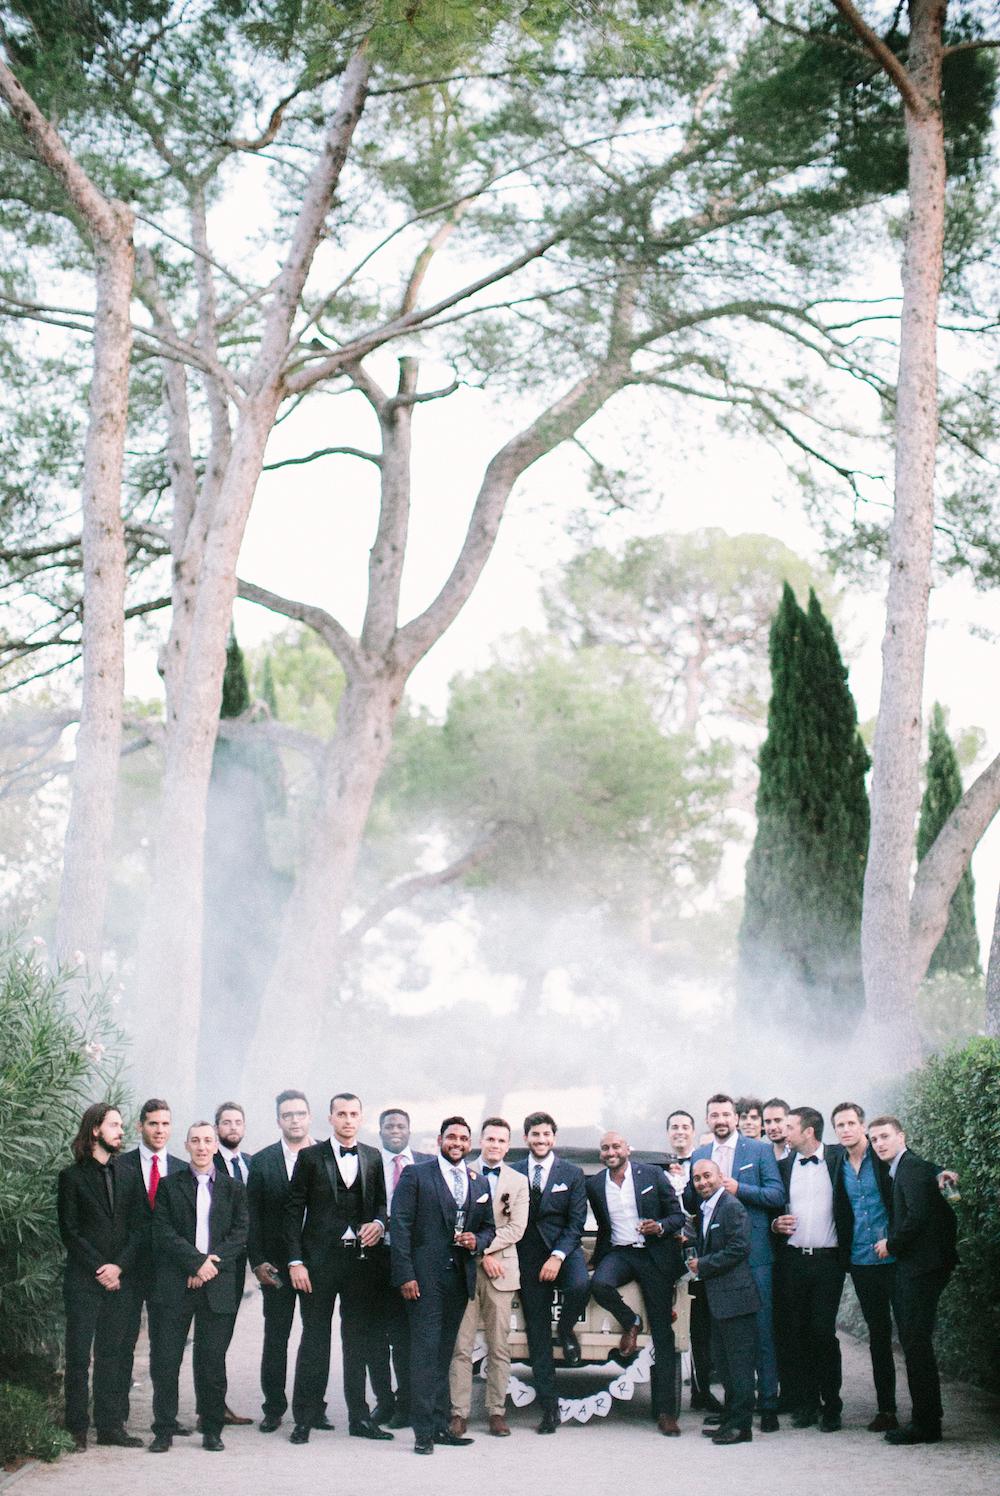 ©-saya-photography-studio-ohlala-wedding-photographer-photographe-mariage-chateau-de-la-tour-vaucros-avignon-244.jpg